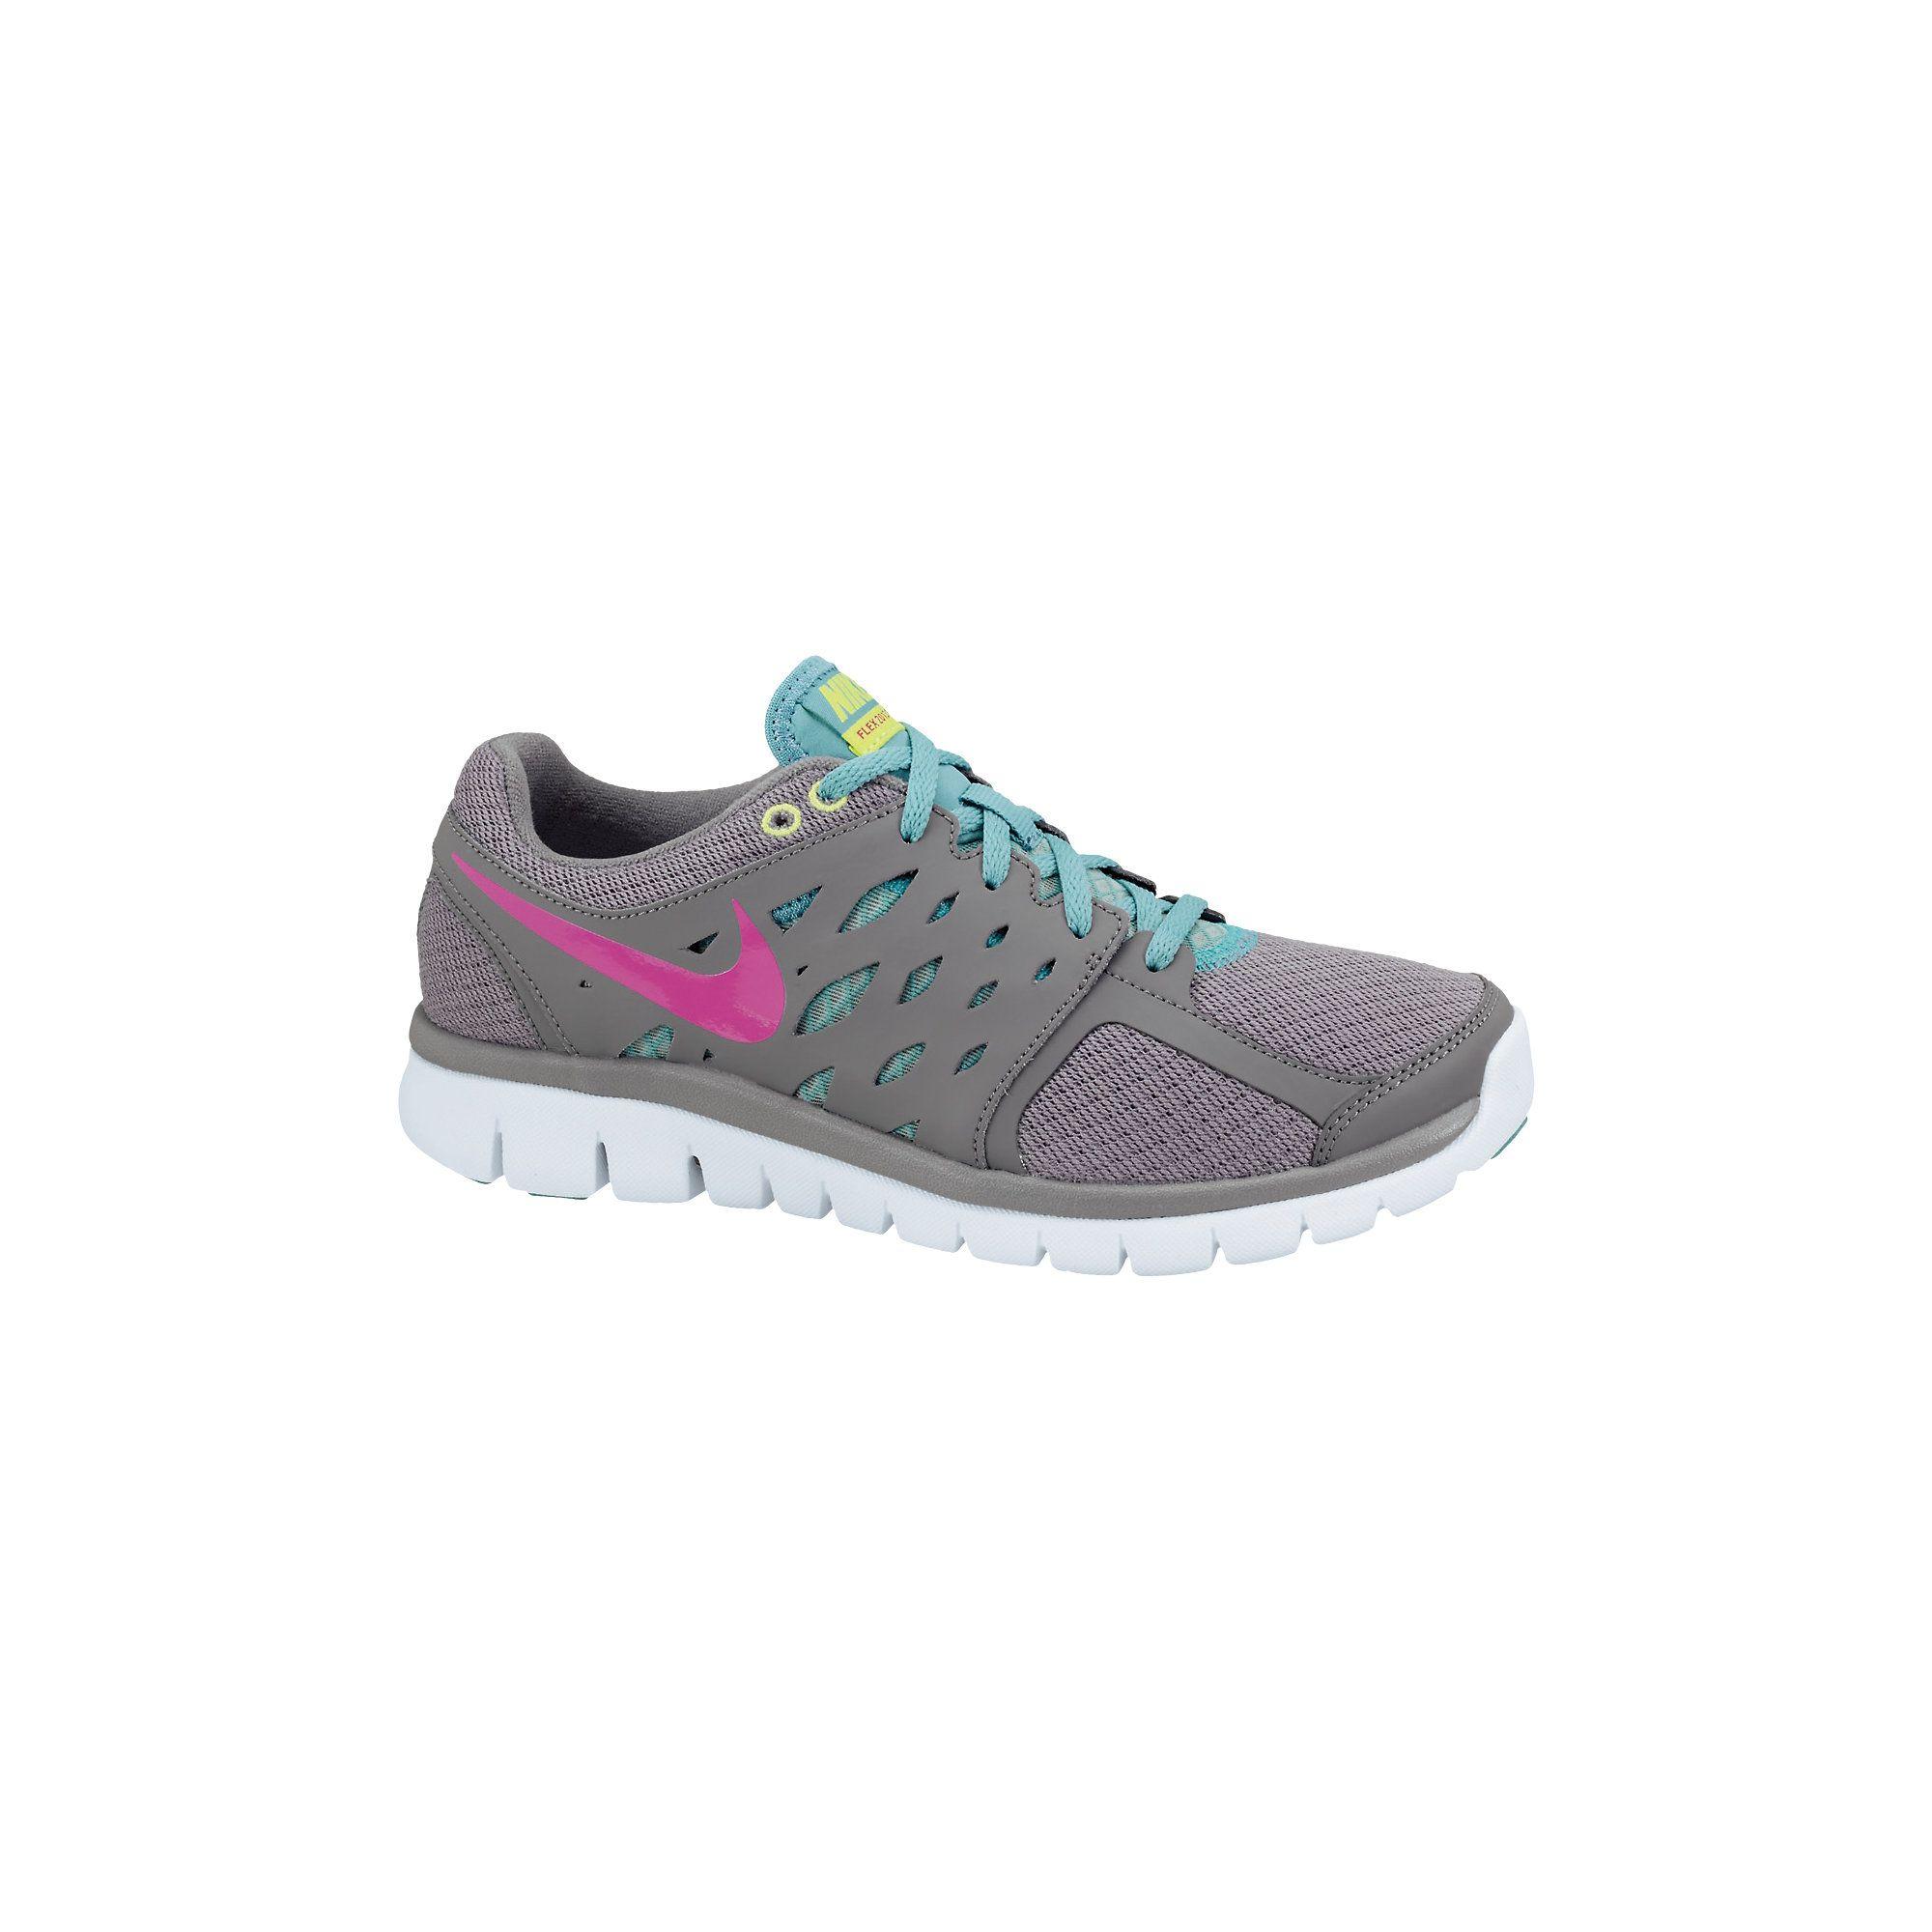 Women's Nike Flex 2013 Run from Hibbett Sports Nike flex